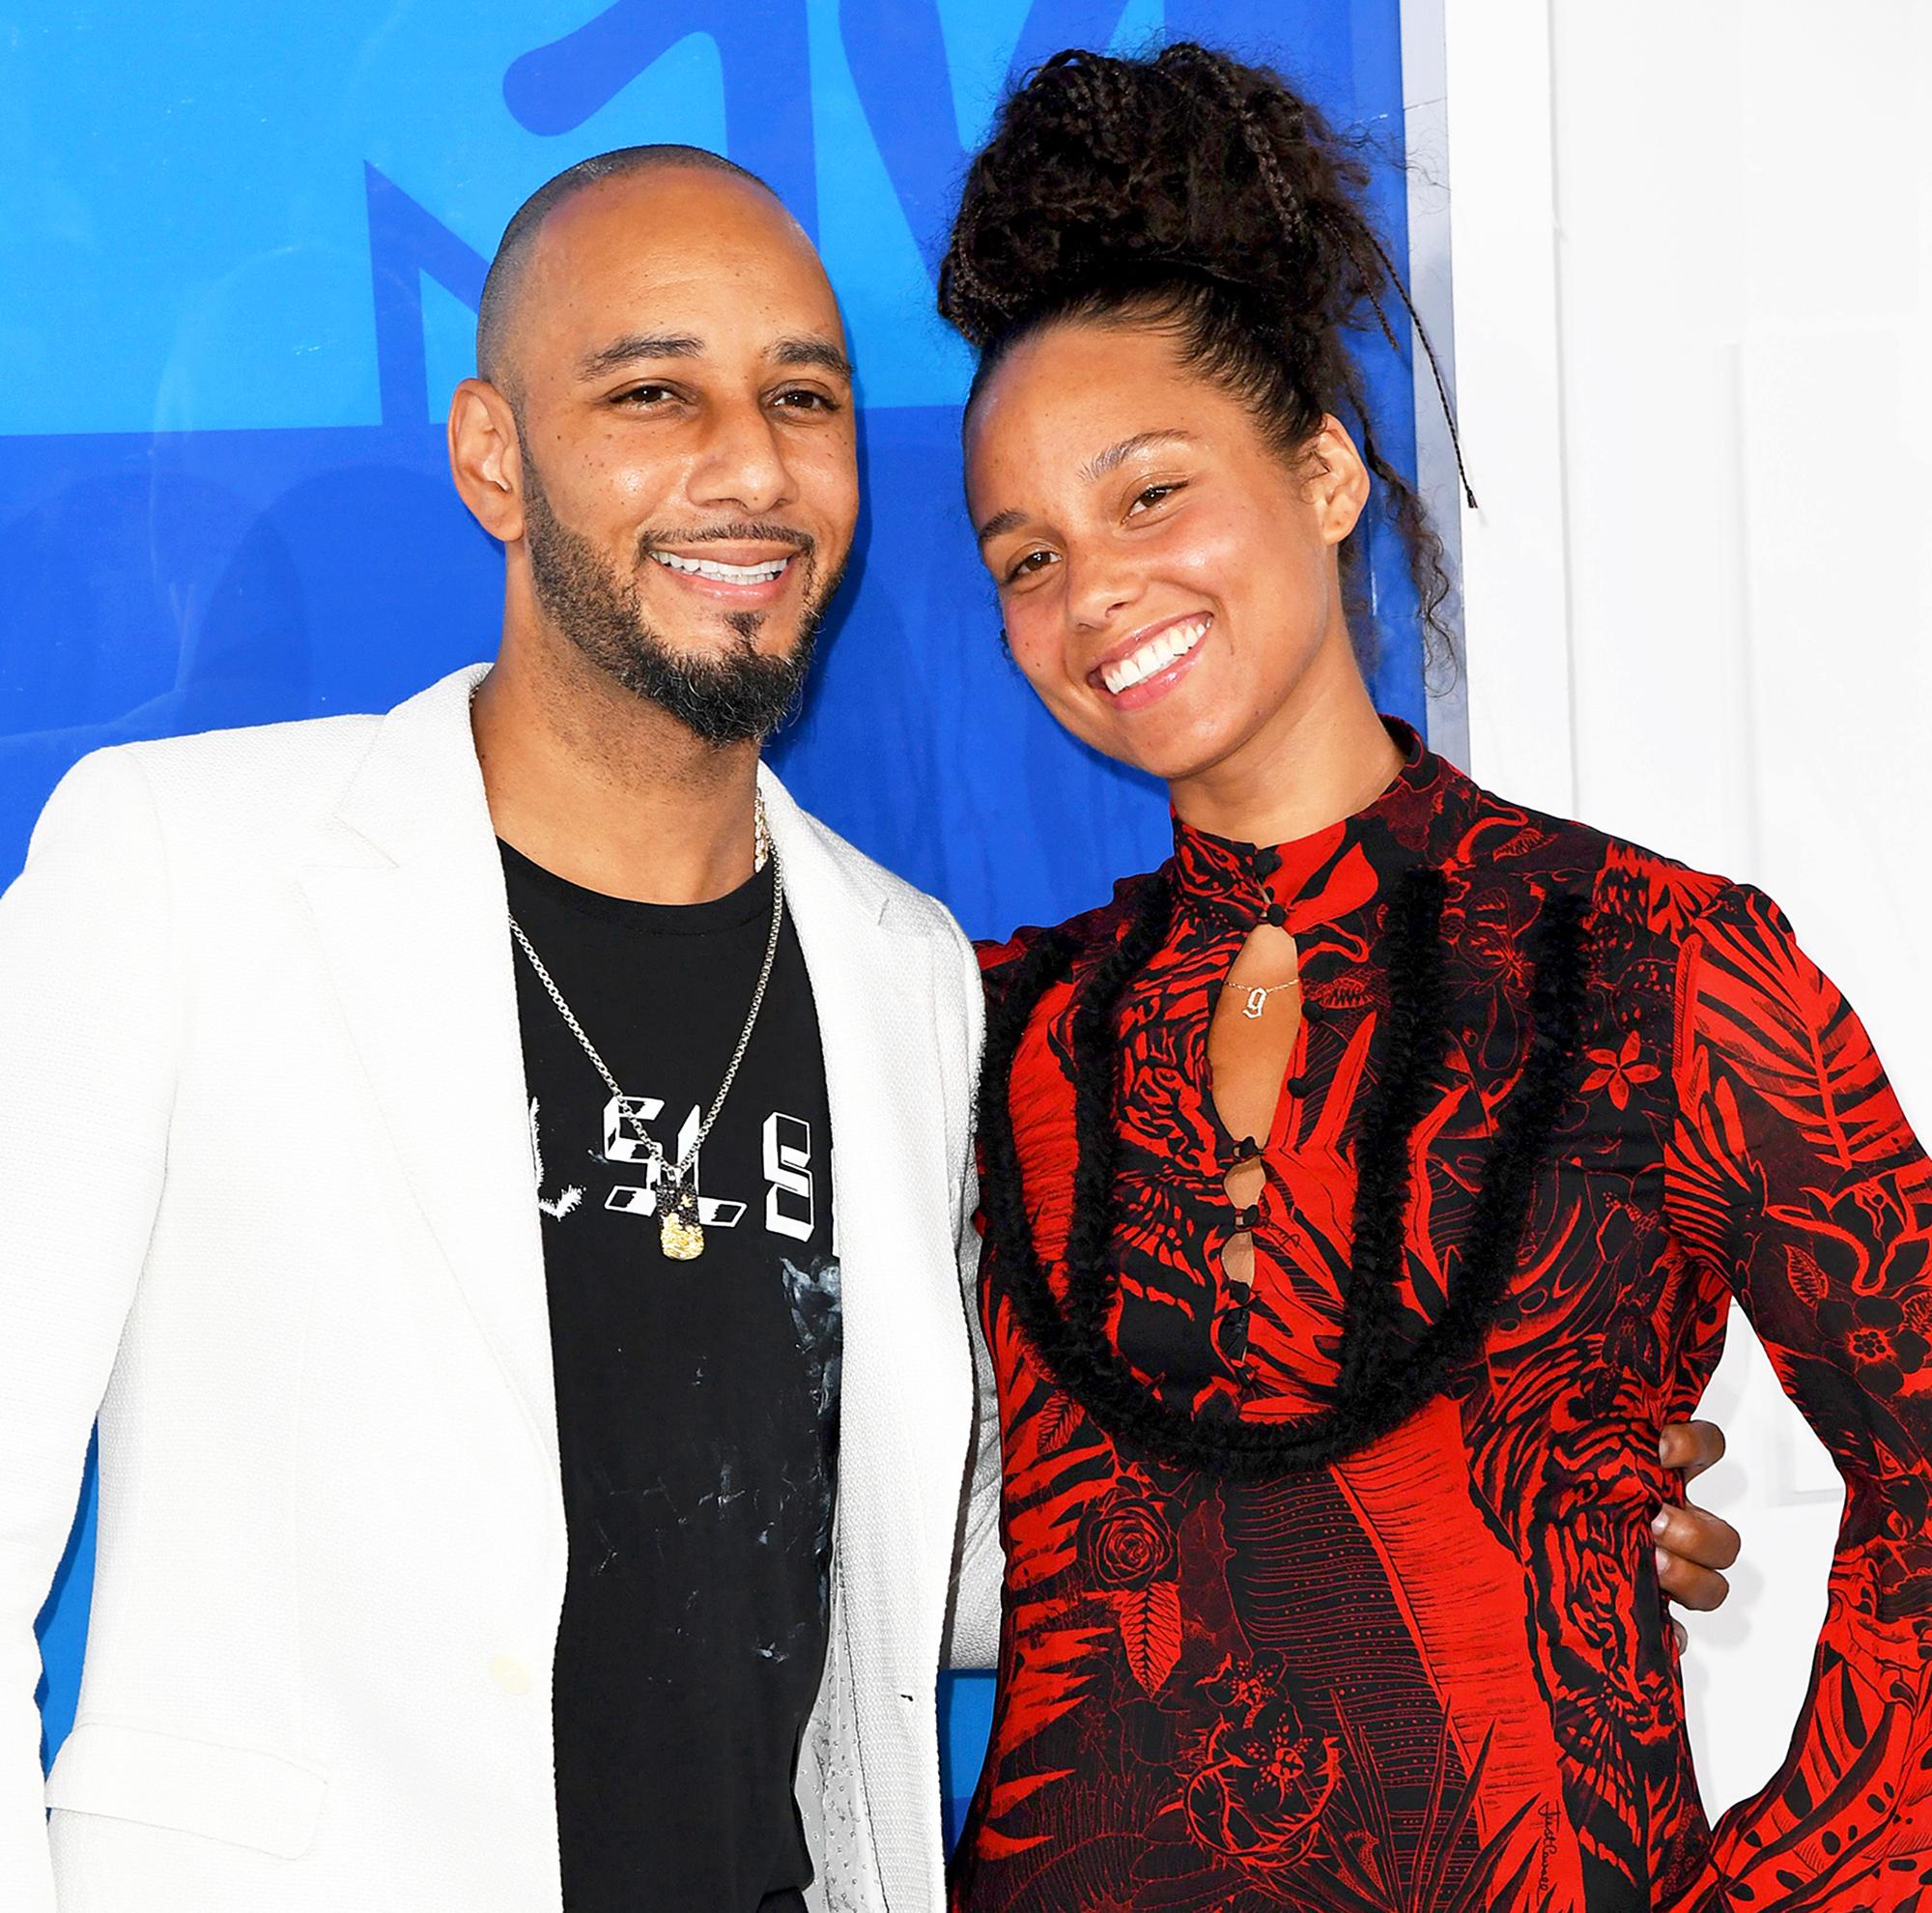 Alicia Keys Pens Anniversary Note to Swizz Beatz